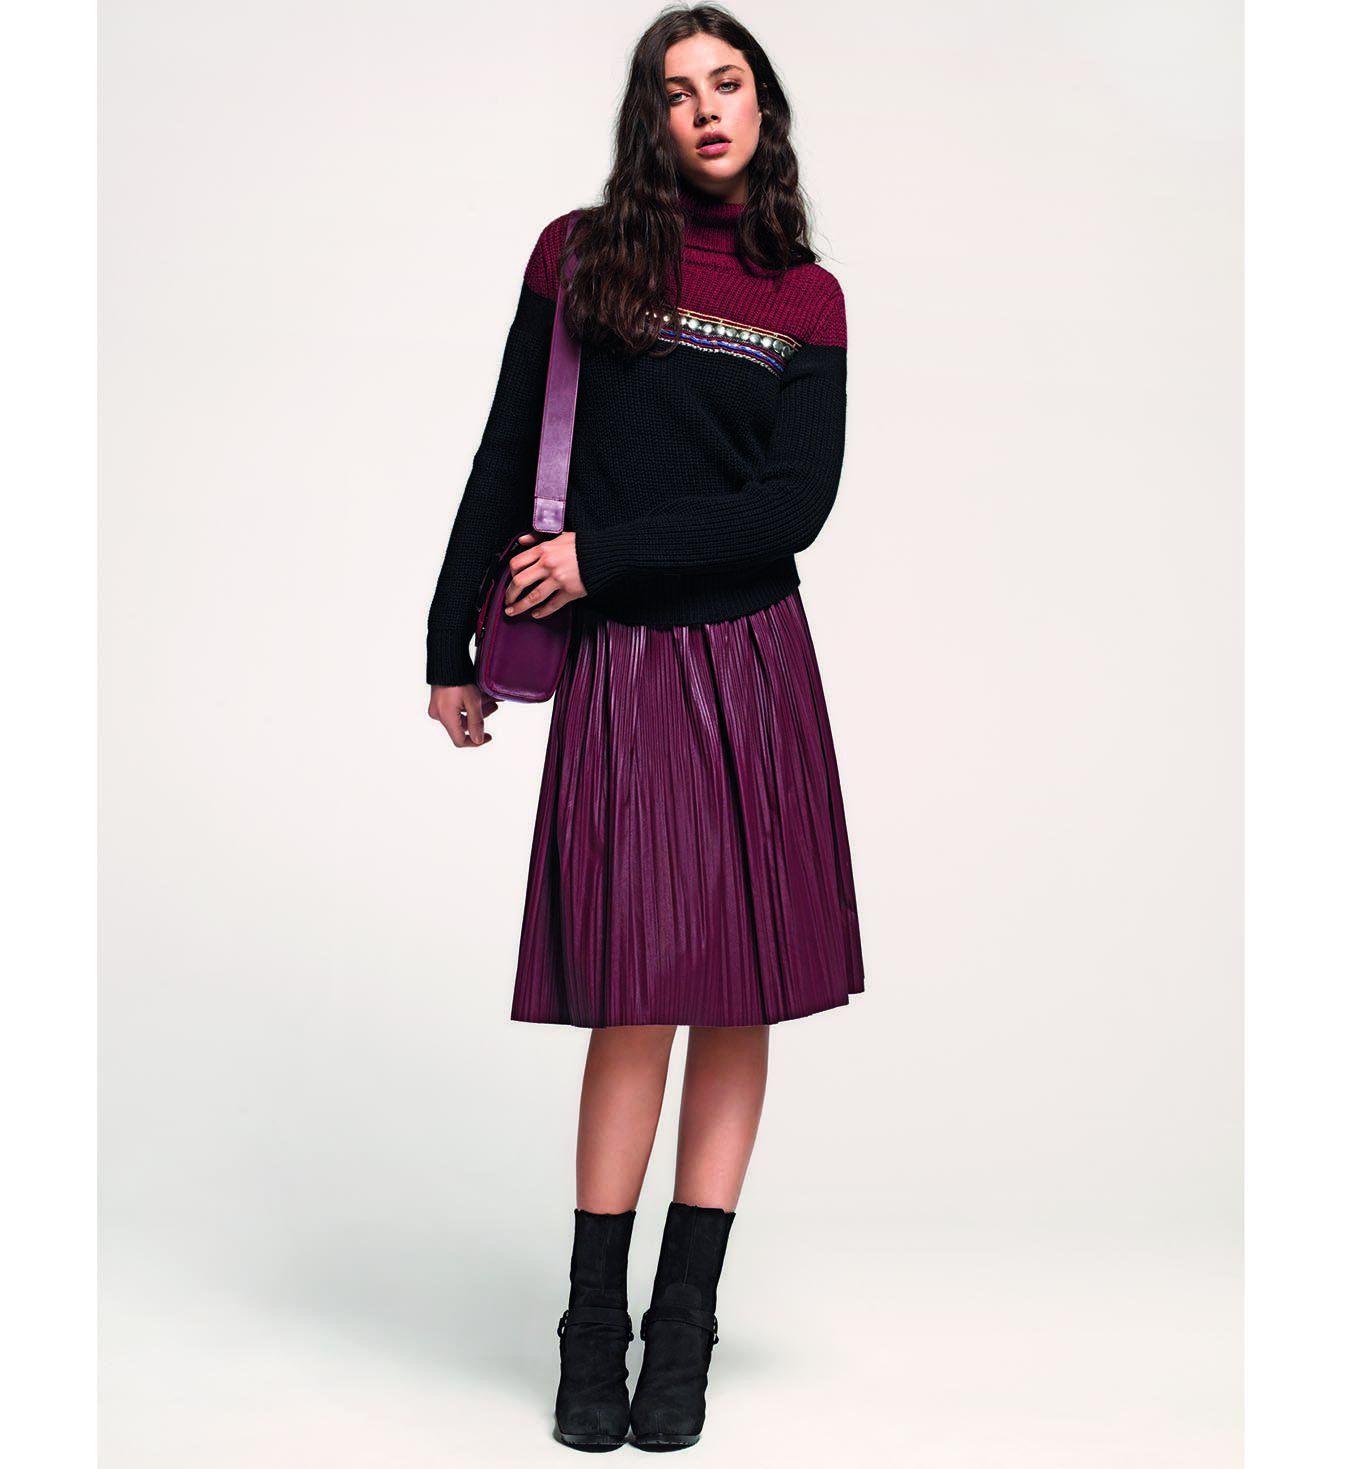 La jupe midi Liu Jo, tendance mode automne hiver 2014-2015